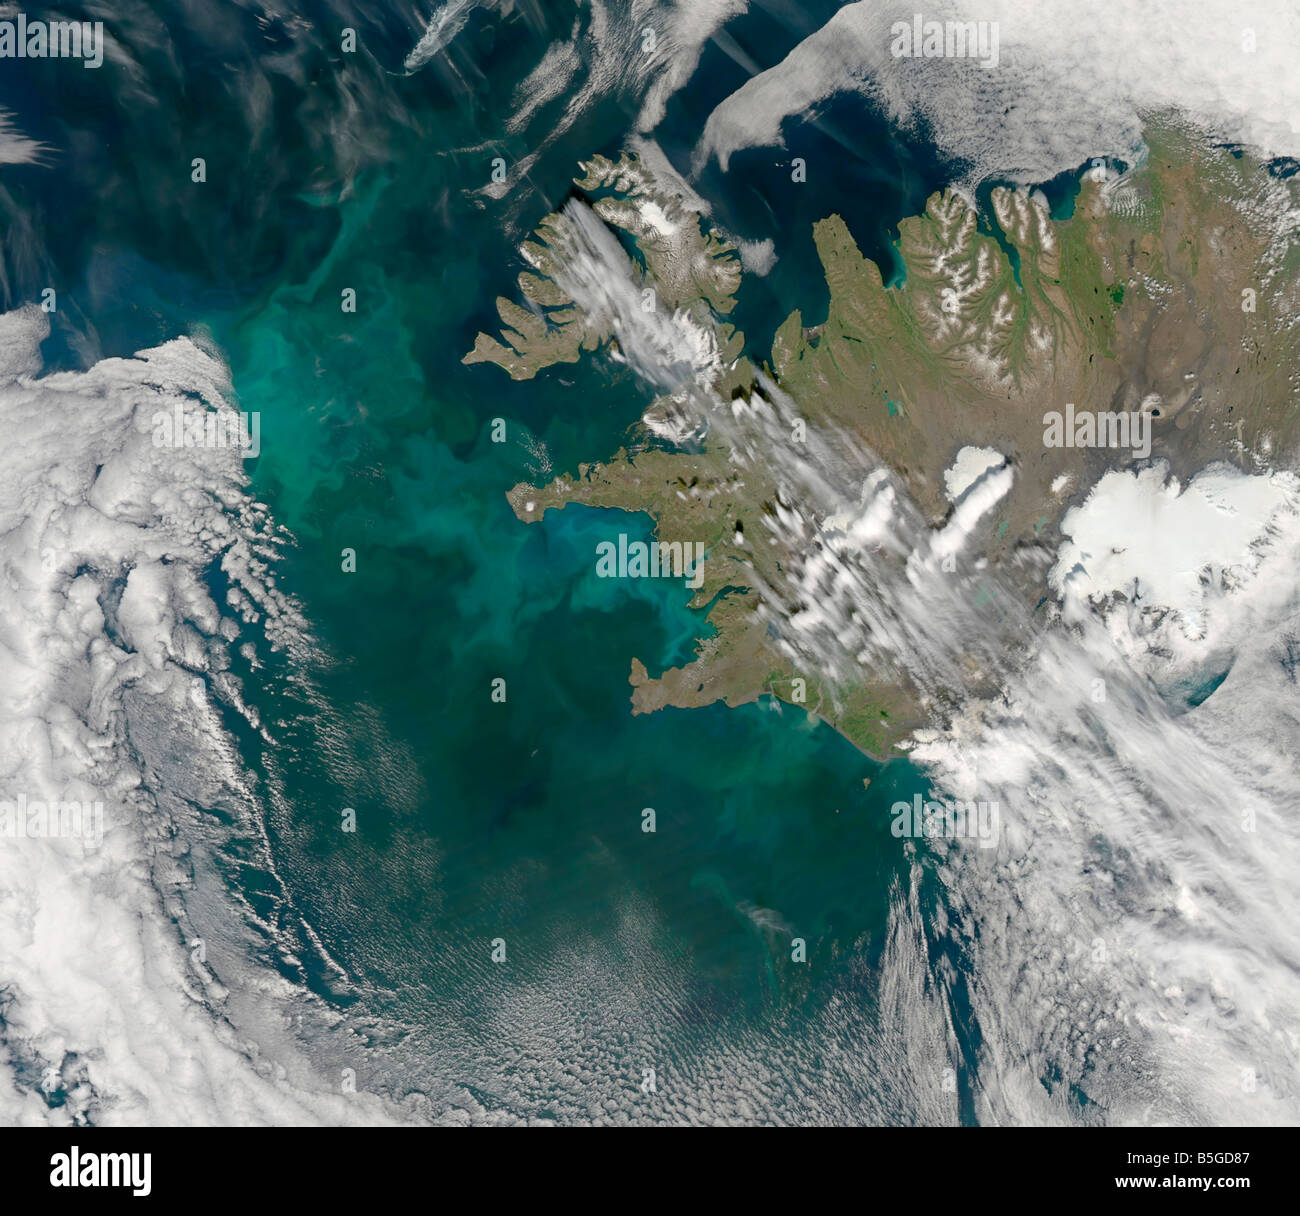 Phytoplankton bloom in the North Atlantic Ocean. Stock Photo